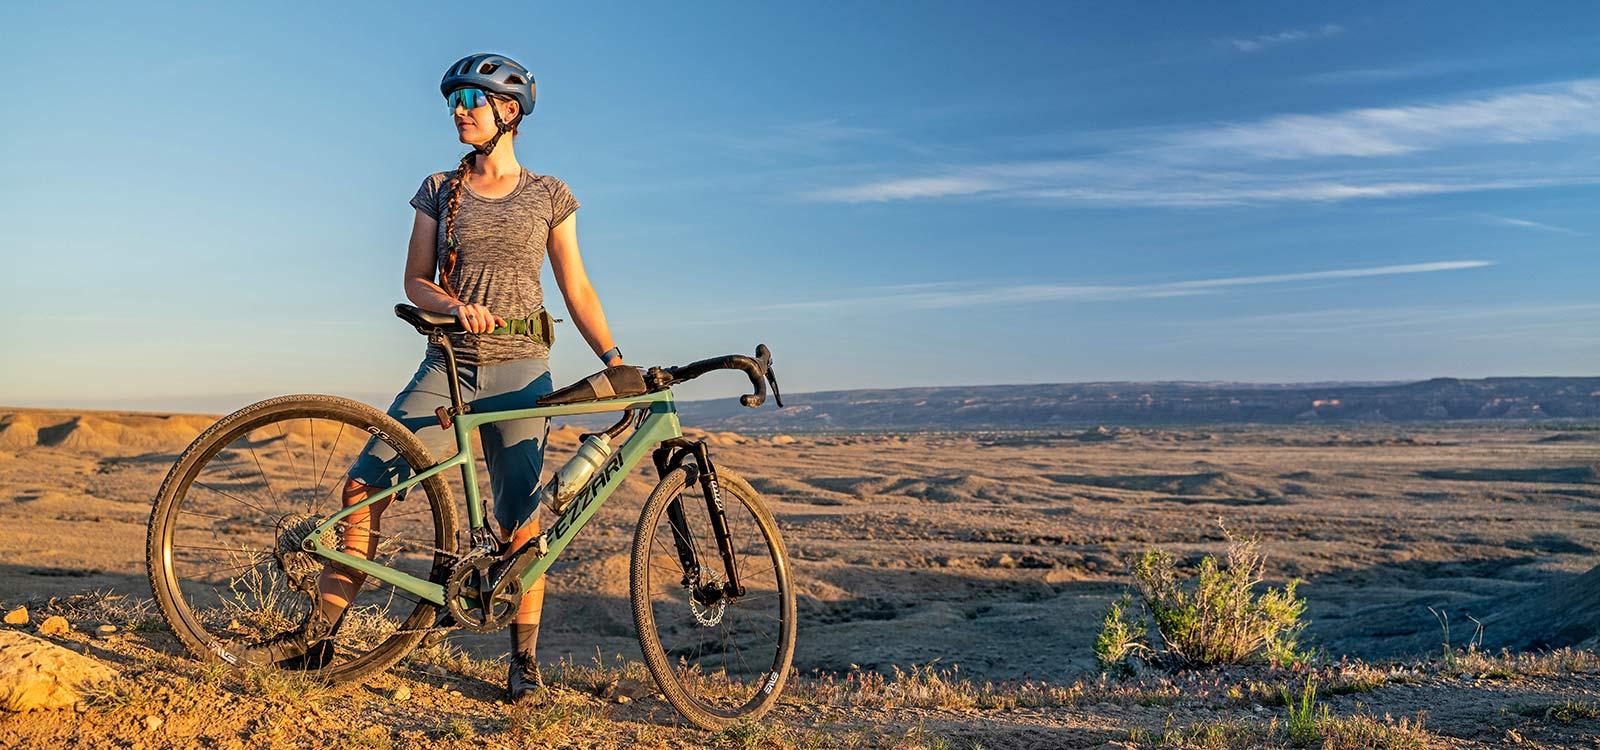 All-new MRP Baxter gravel fork, lightweight 40mm 60mm gravel bike-specific suspension,Colorado